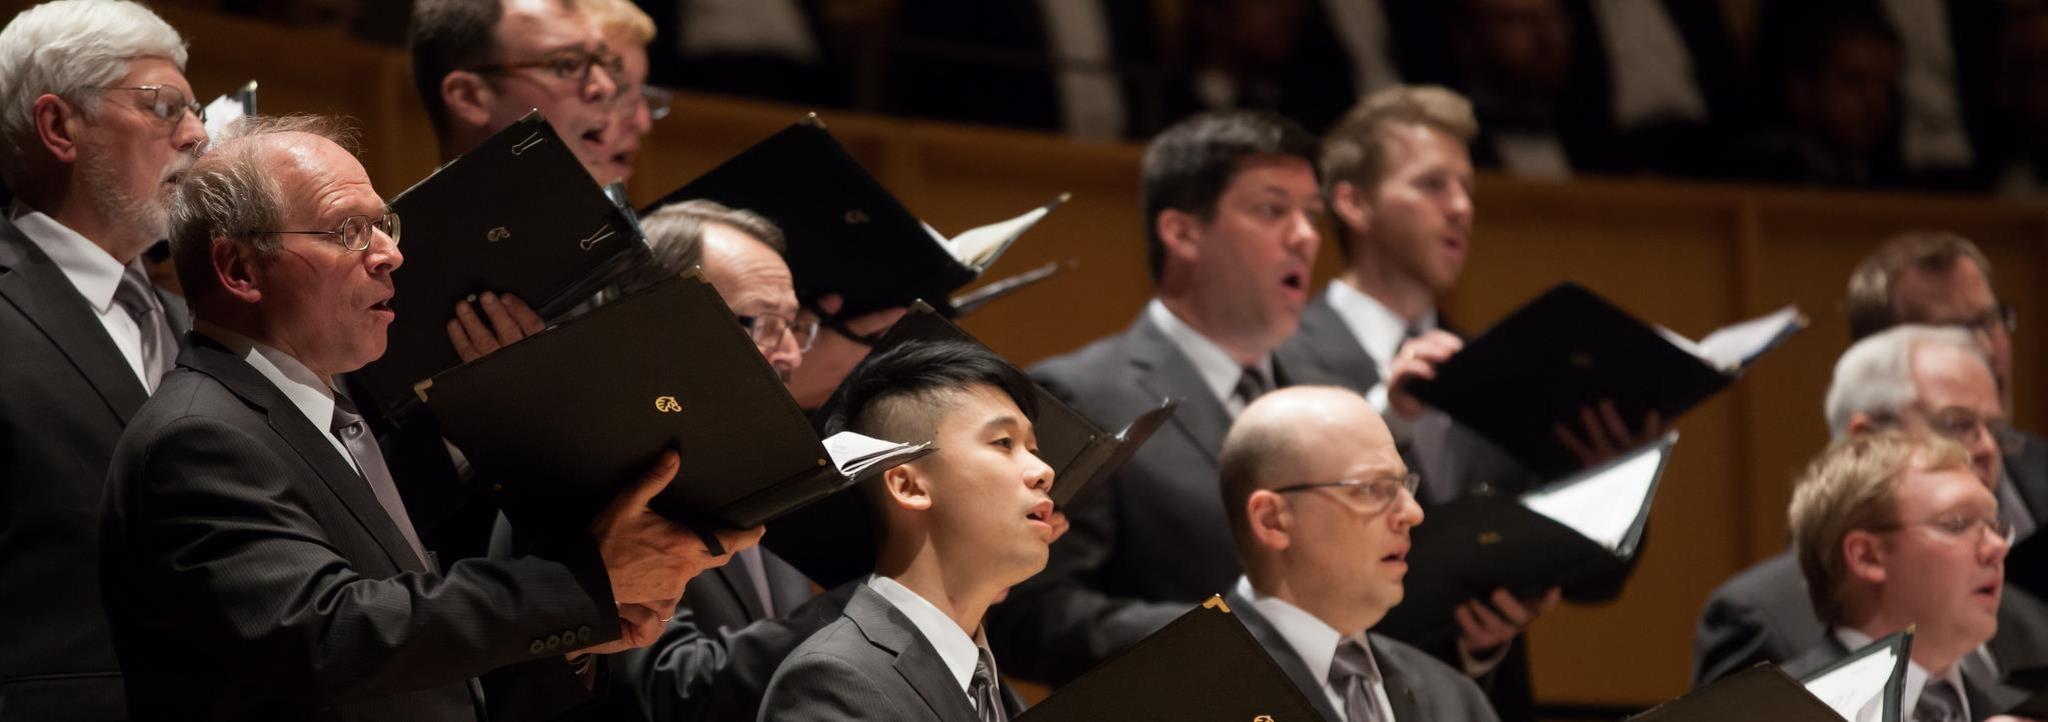 Chor Leoni men's choir celebrates Leonard Cohen on new album